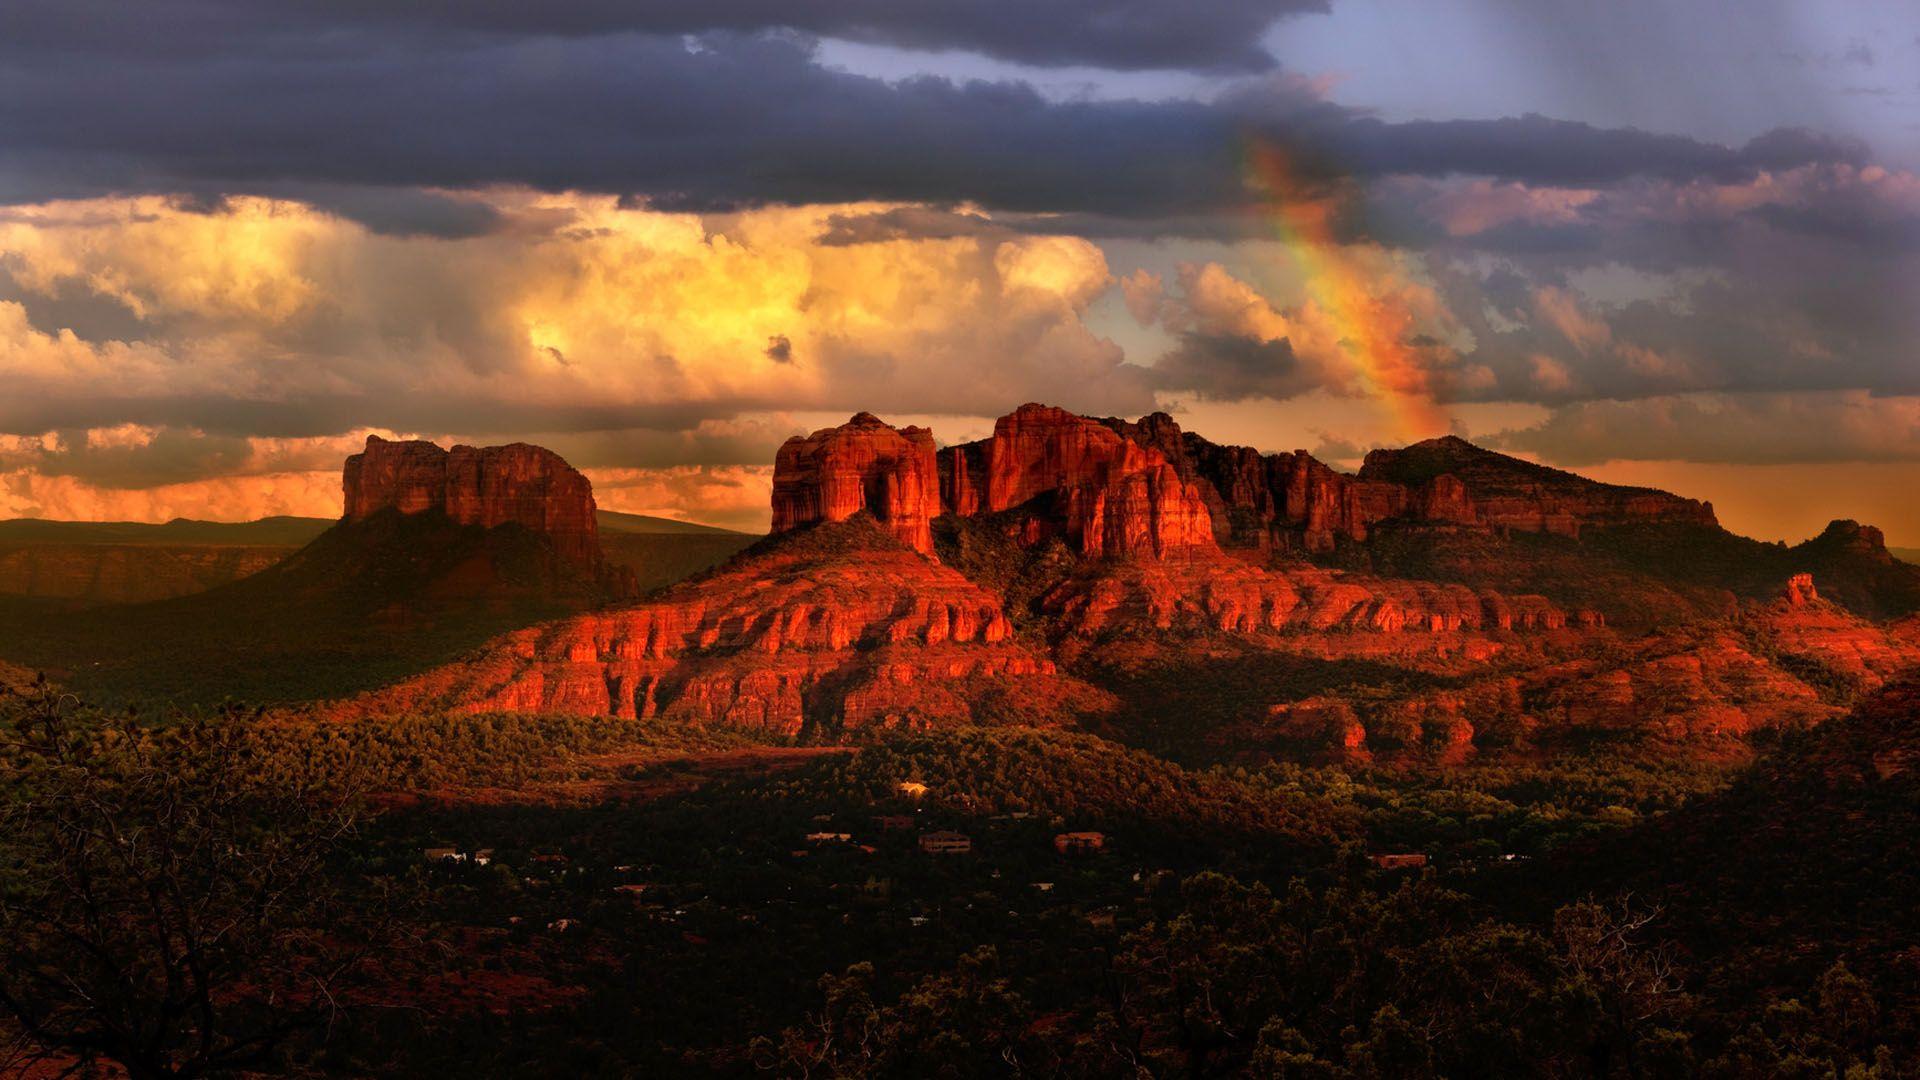 wallpaper sunset mountain arizona - photo #45